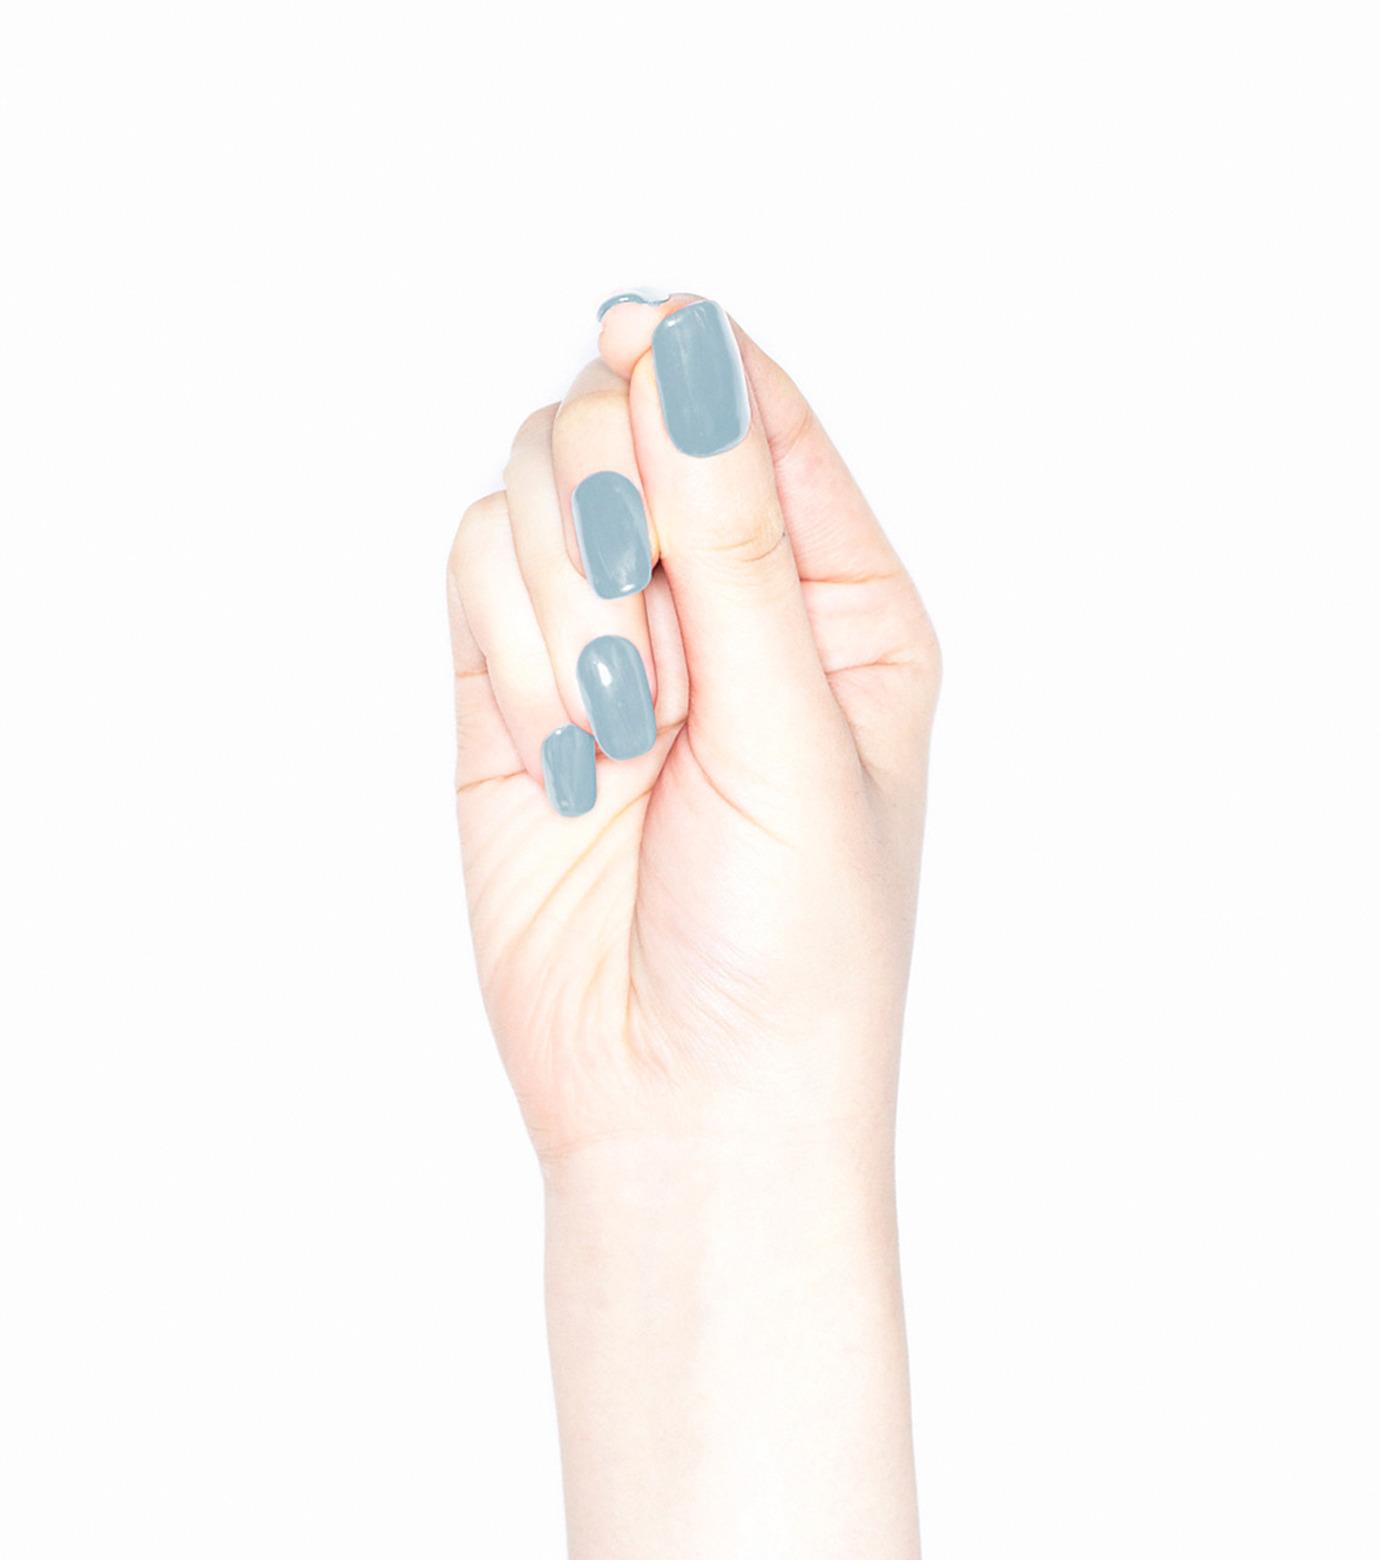 GRANJE(グランジェ)のBristol-LIGHT BLUE(MAKE-UP/MAKE-UP)-O78-91 拡大詳細画像2